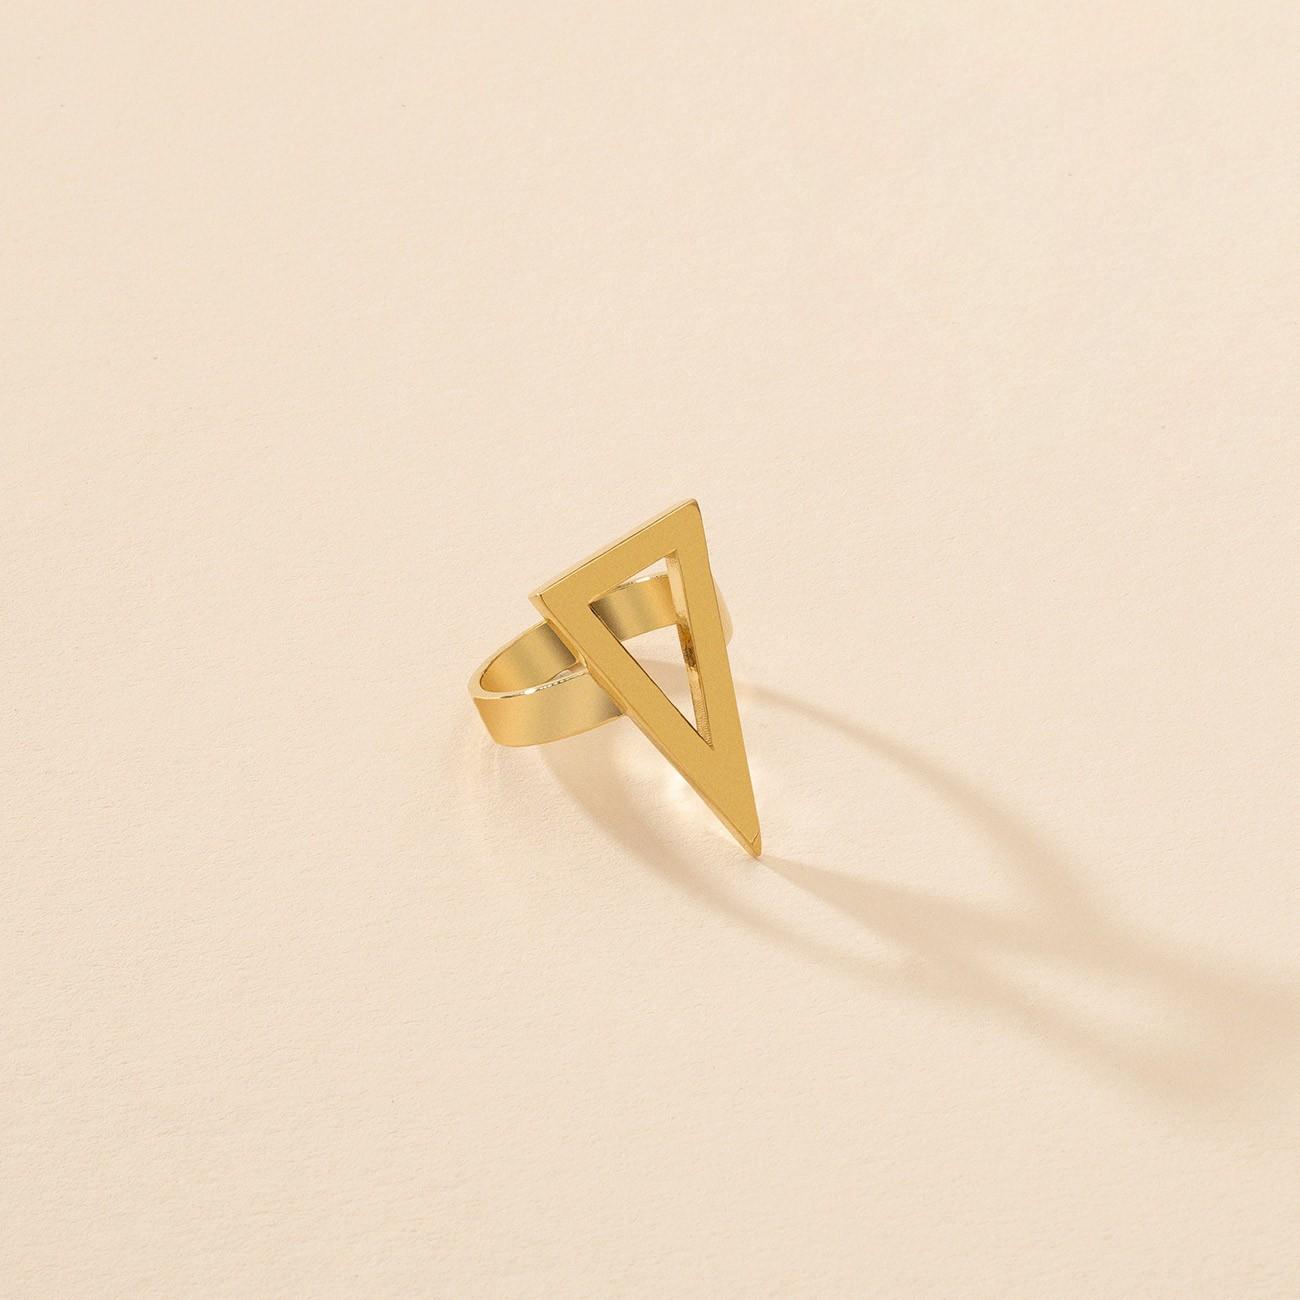 Pierścionek figura geometryczna trójkąt, srebro 925